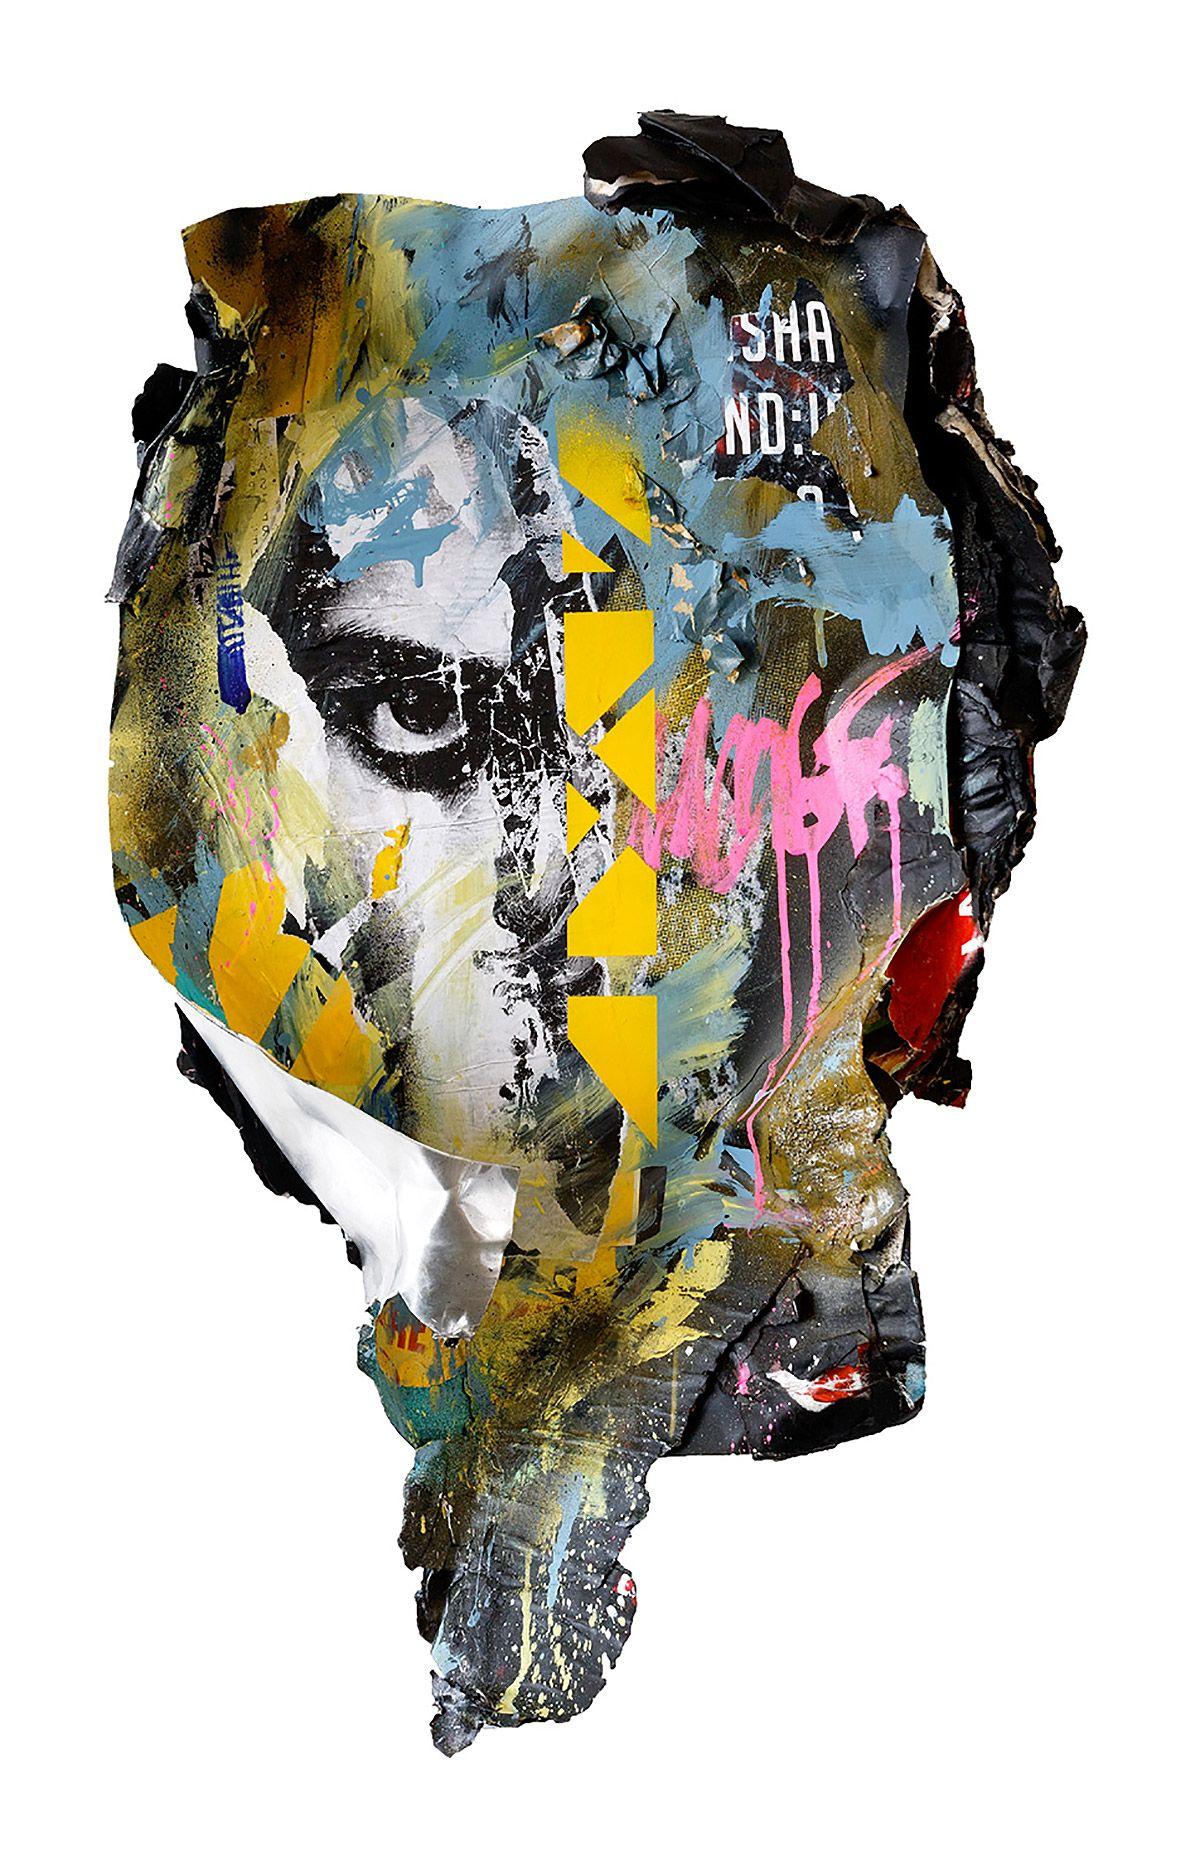 Collage Artworks by Joachim Romain – Inspiration Grid | Design Inspiration #art #artist #artwork #collage #streetart #urban #poster #inspirationgrid